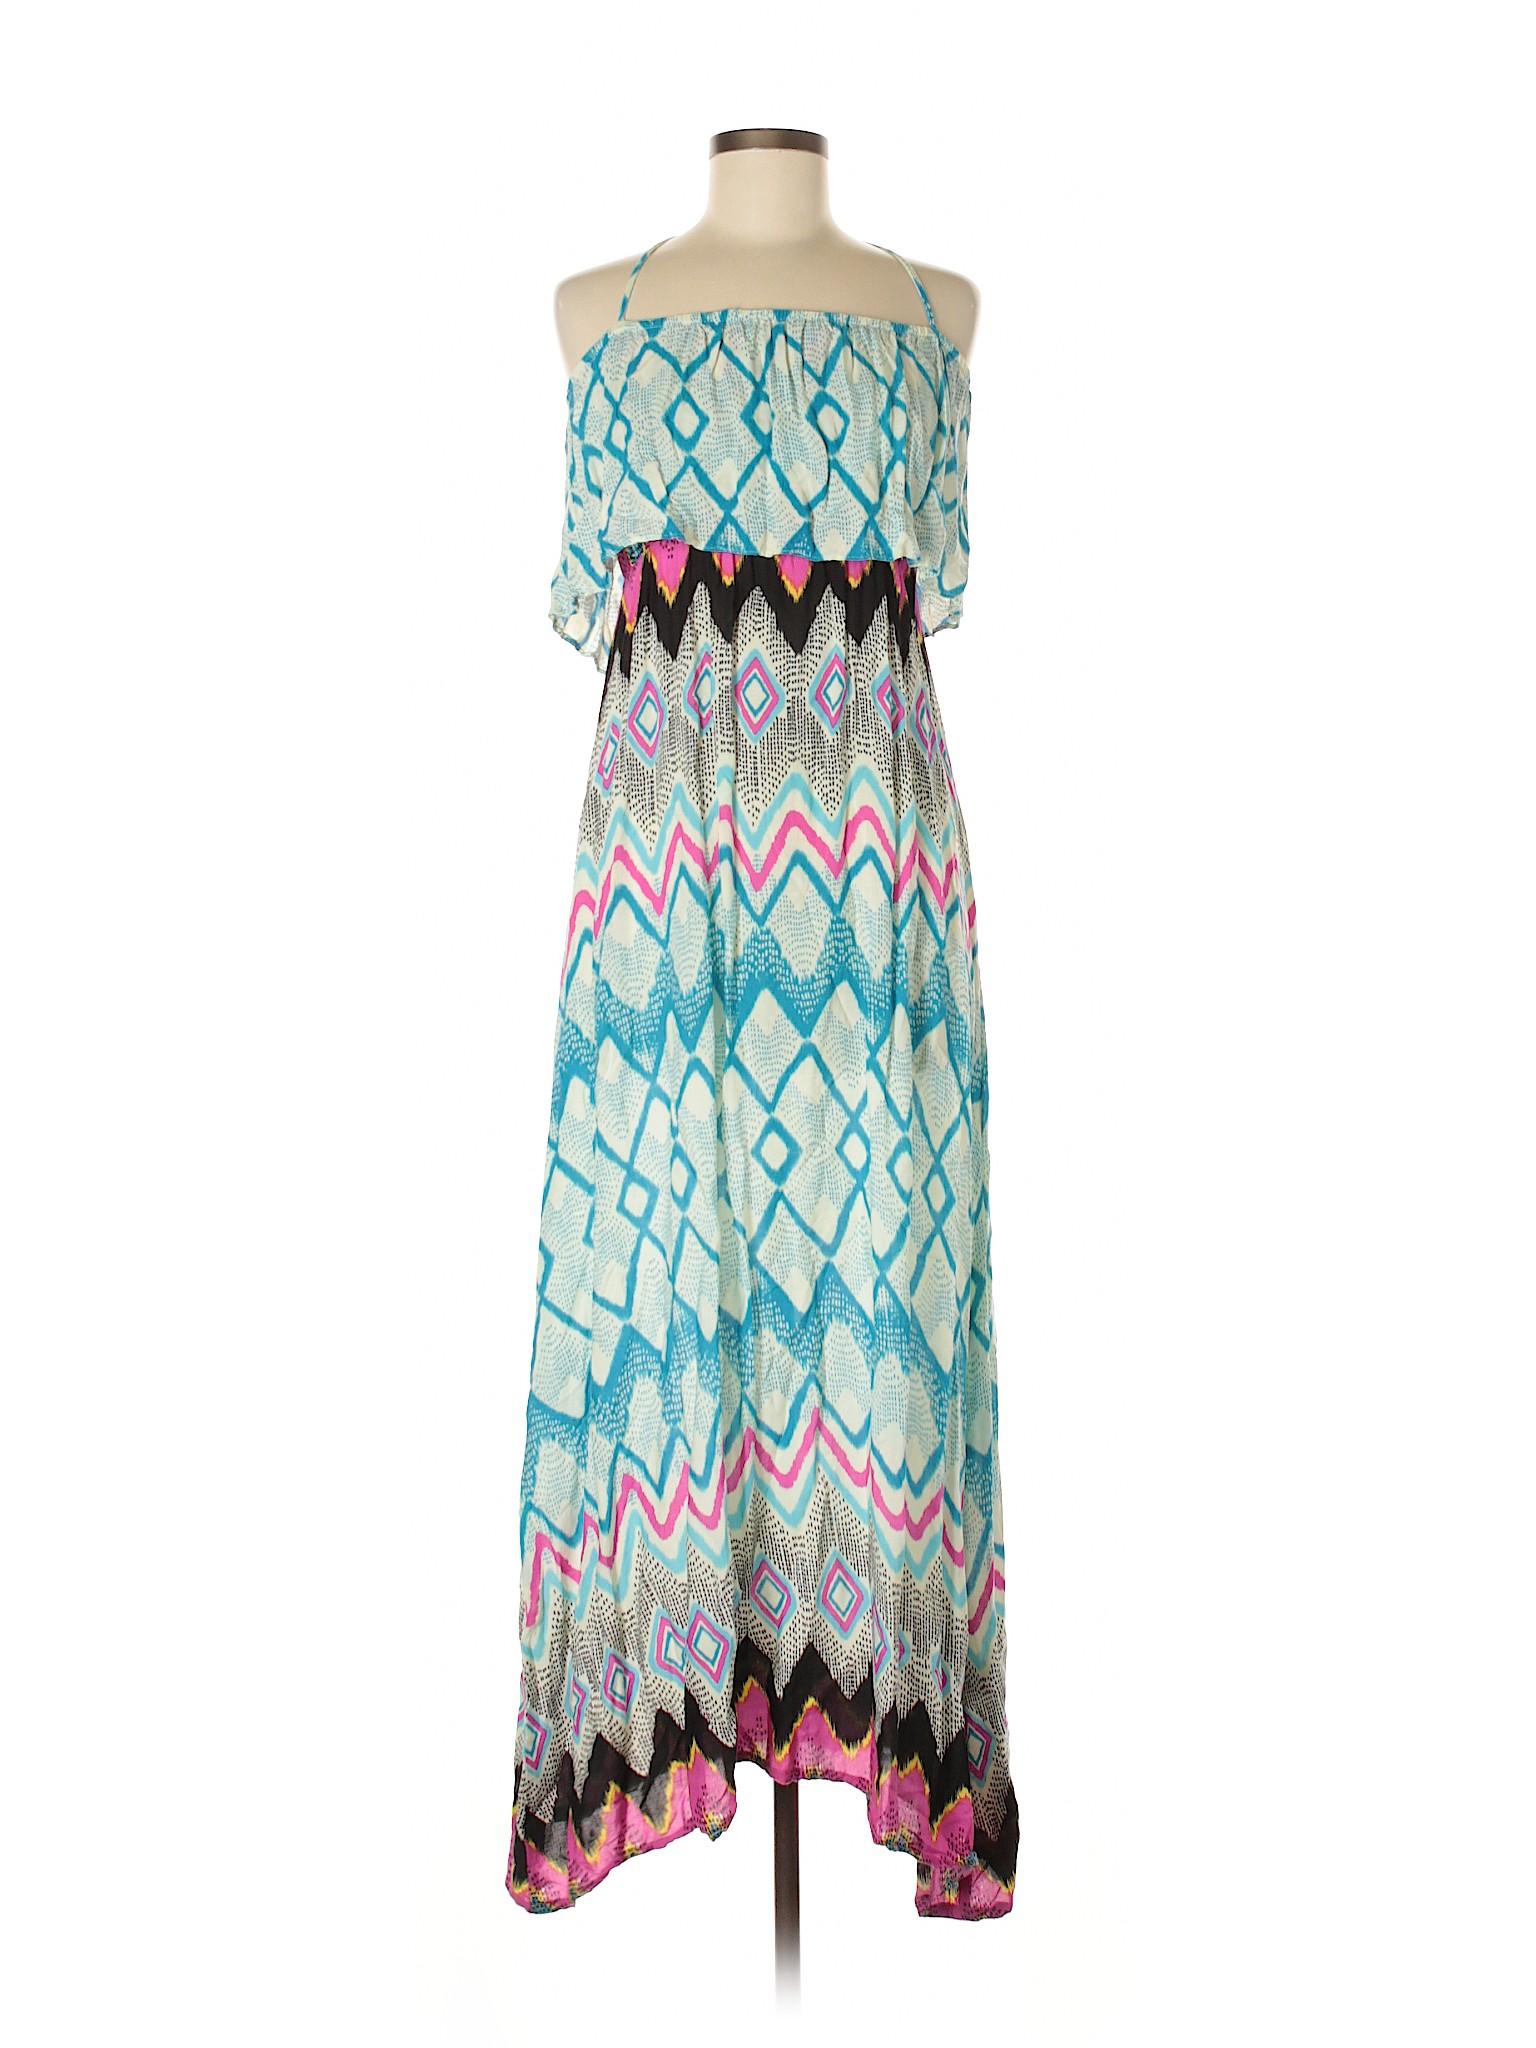 Dress 5Ij98aT3kG Ark amp; winter Casual Boutique wq1XHxzP